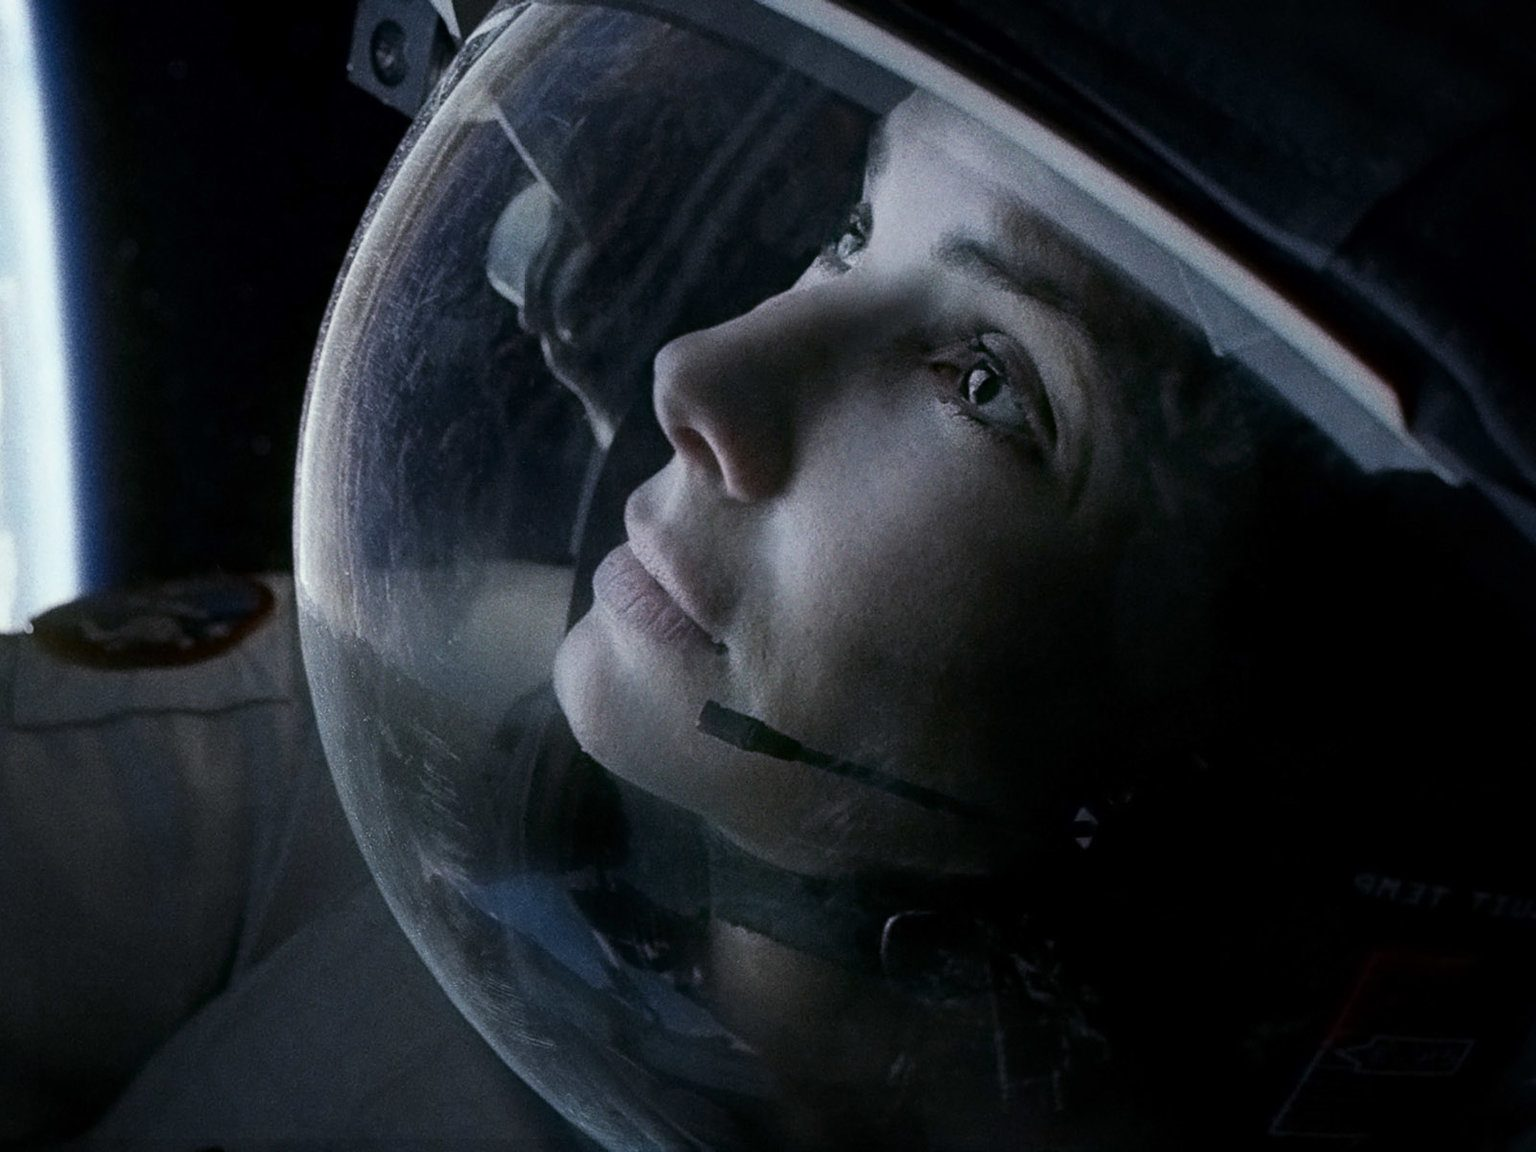 Best sci fi movies on Netflix - Gravity